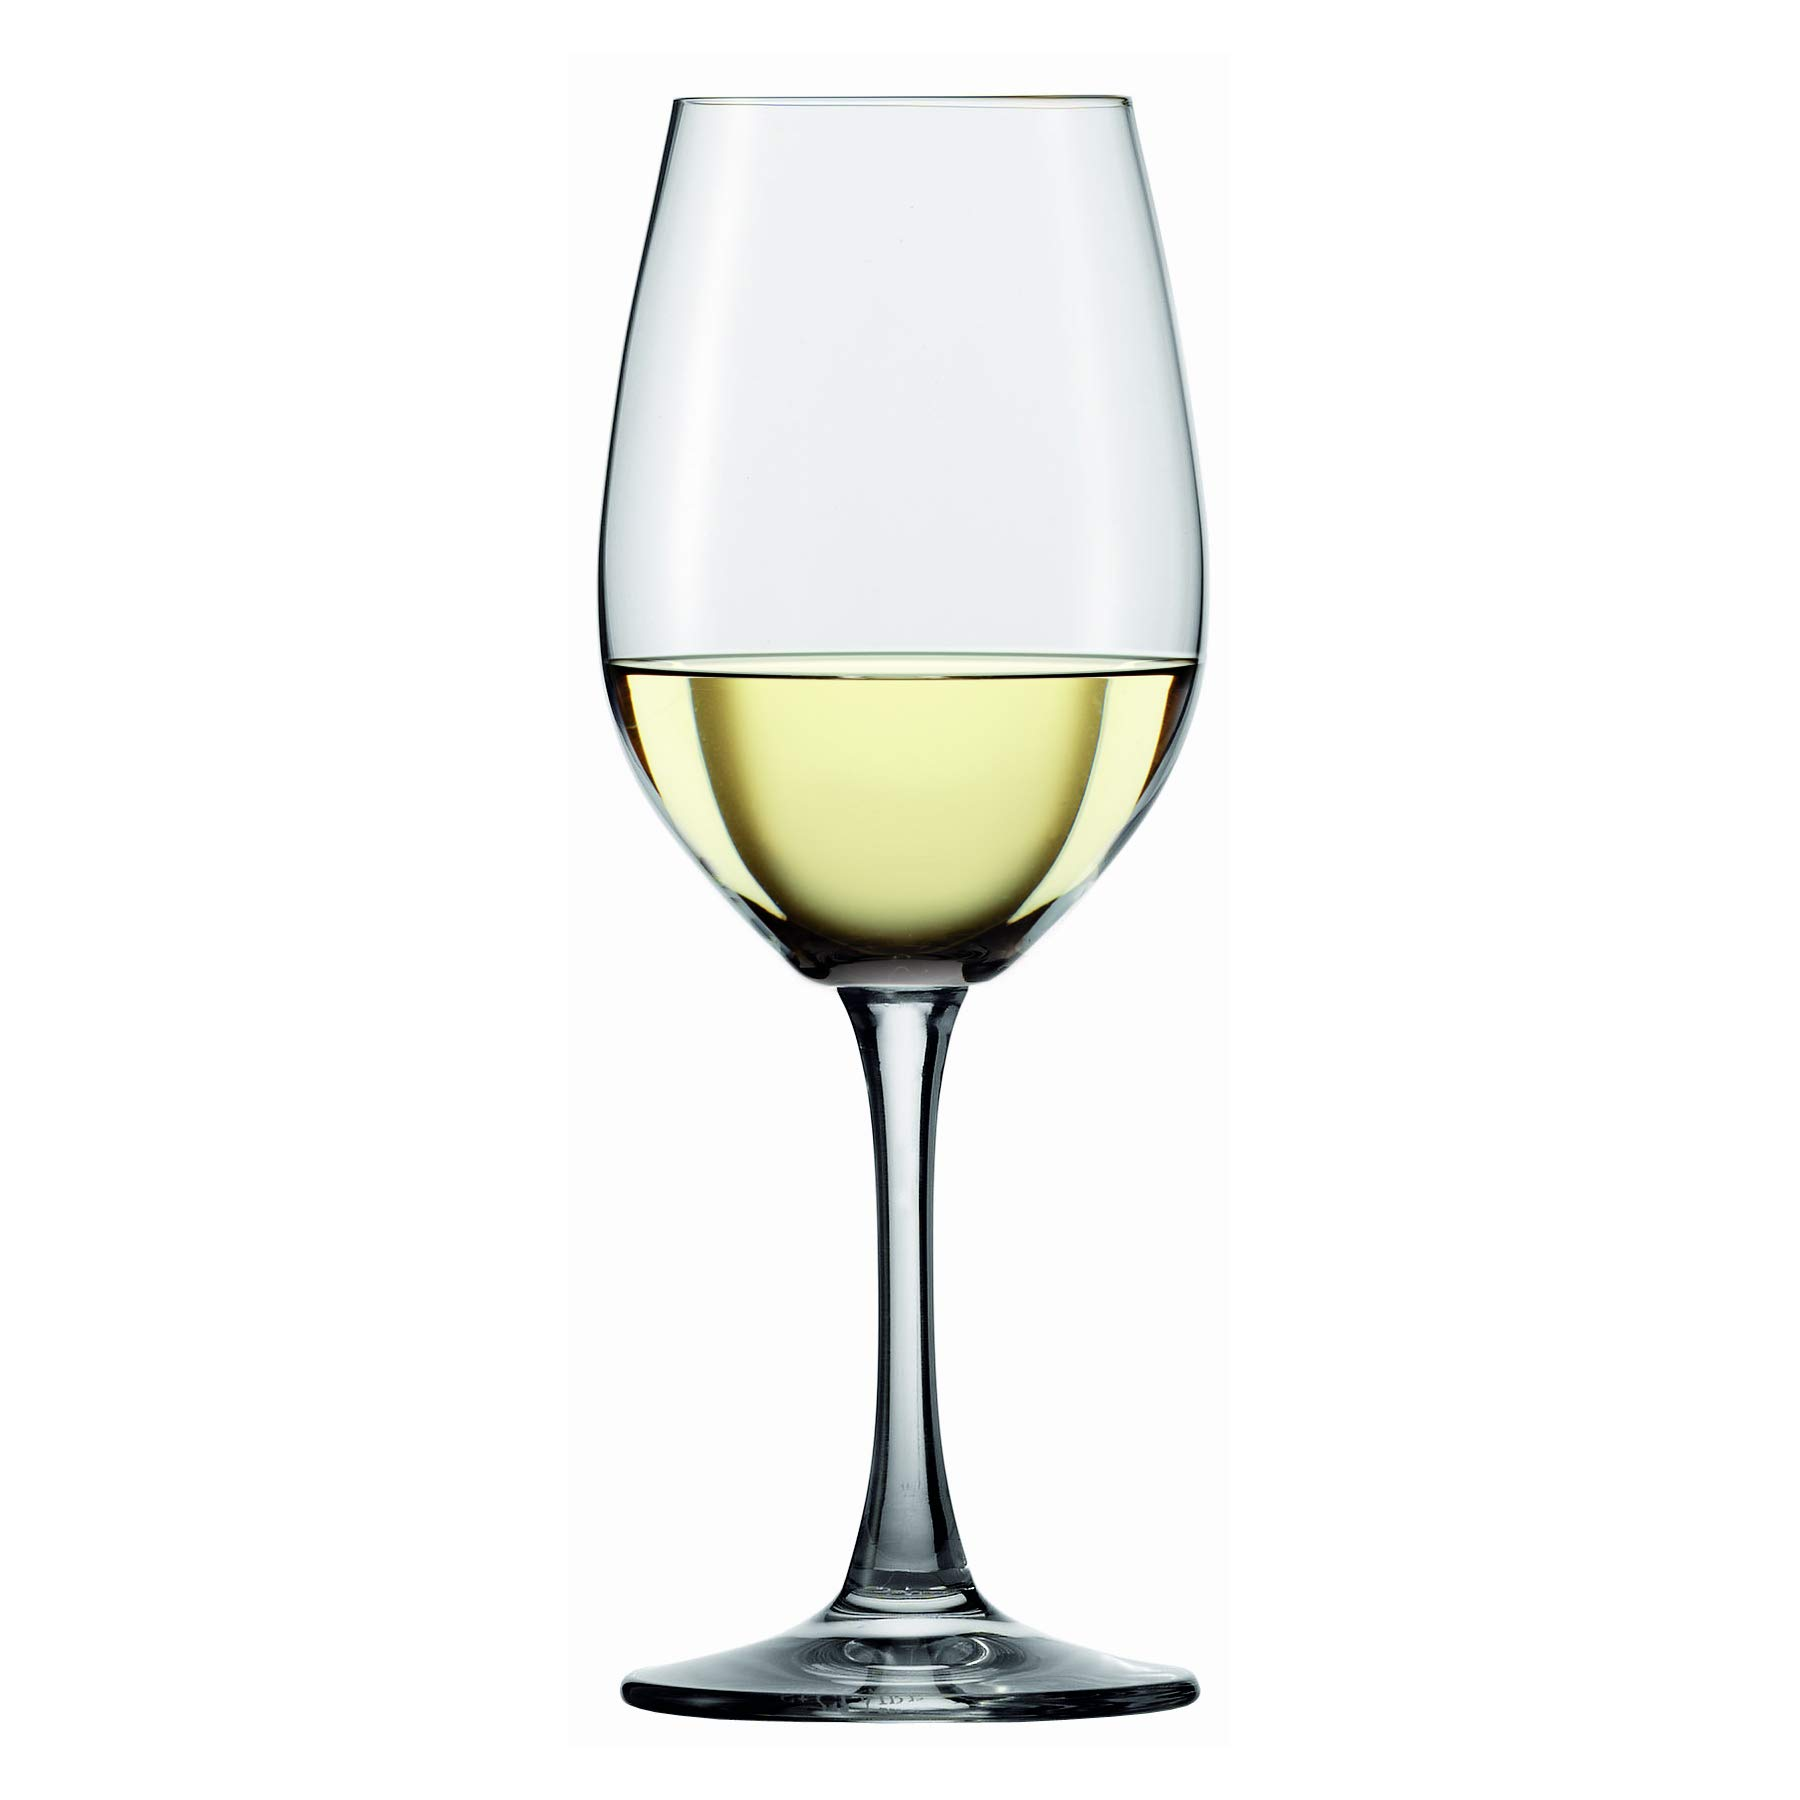 Spiegelau Winelovers White Wine Glass, Set of 4